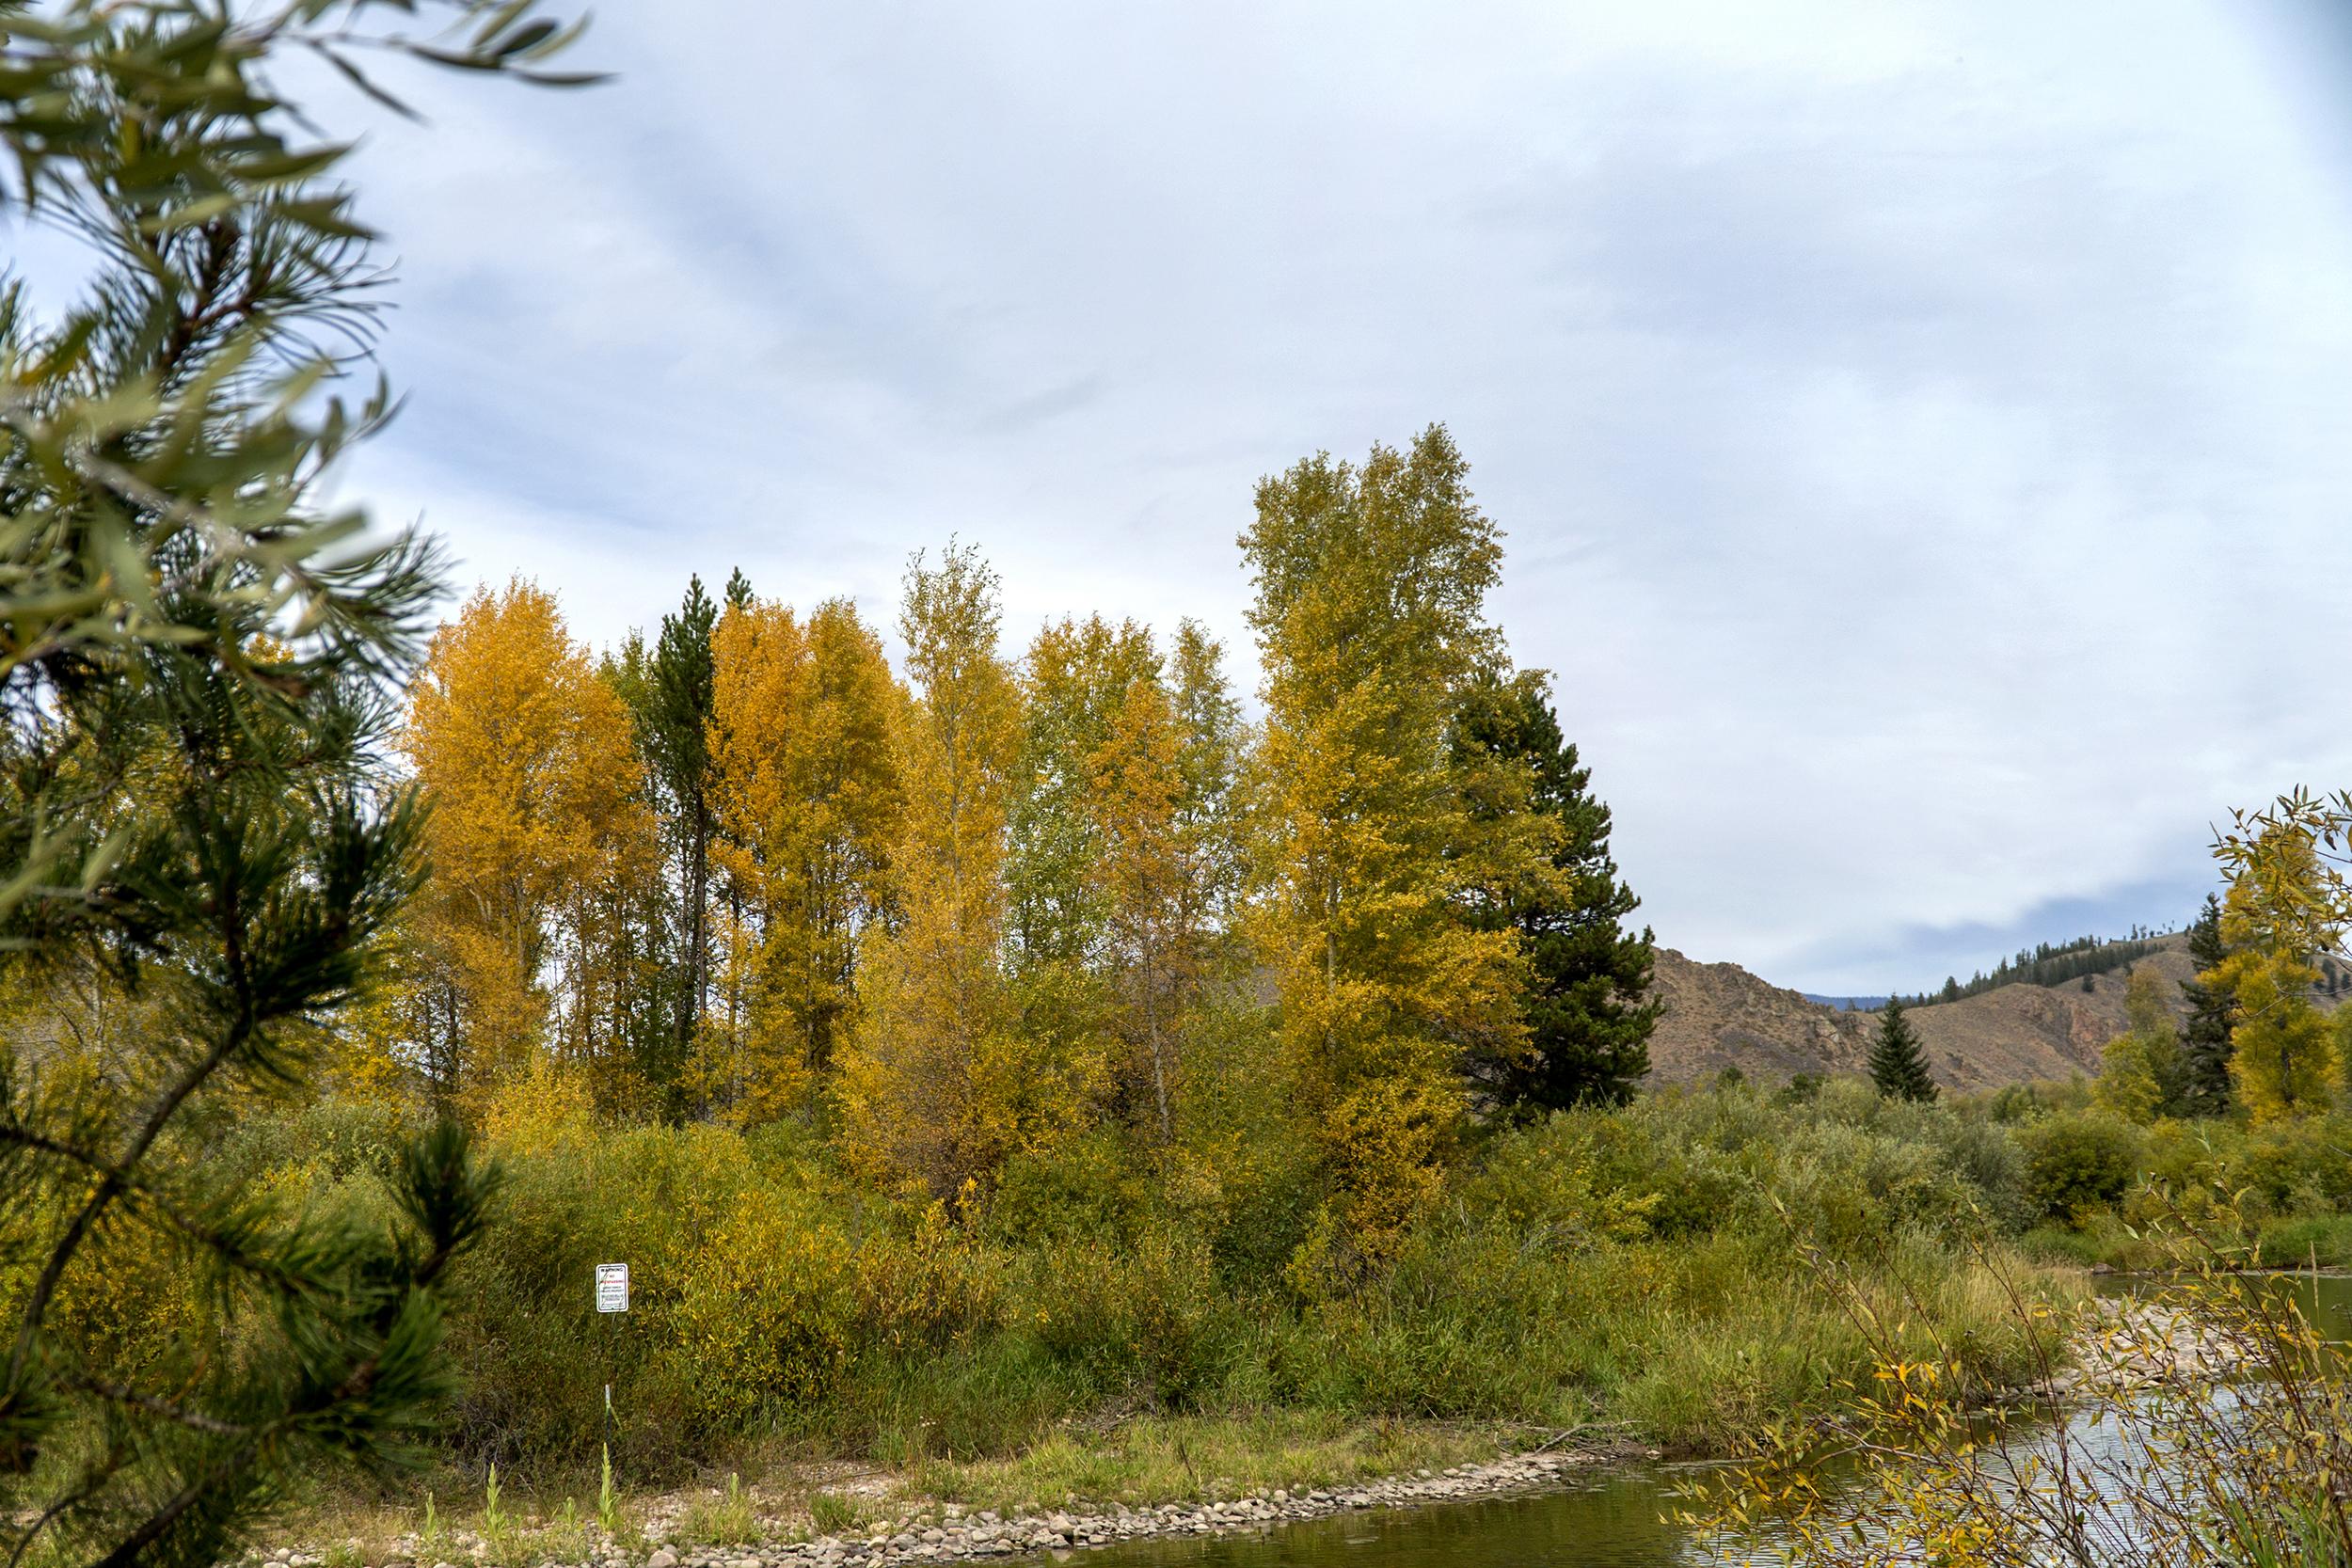 Fall Foliage Granby